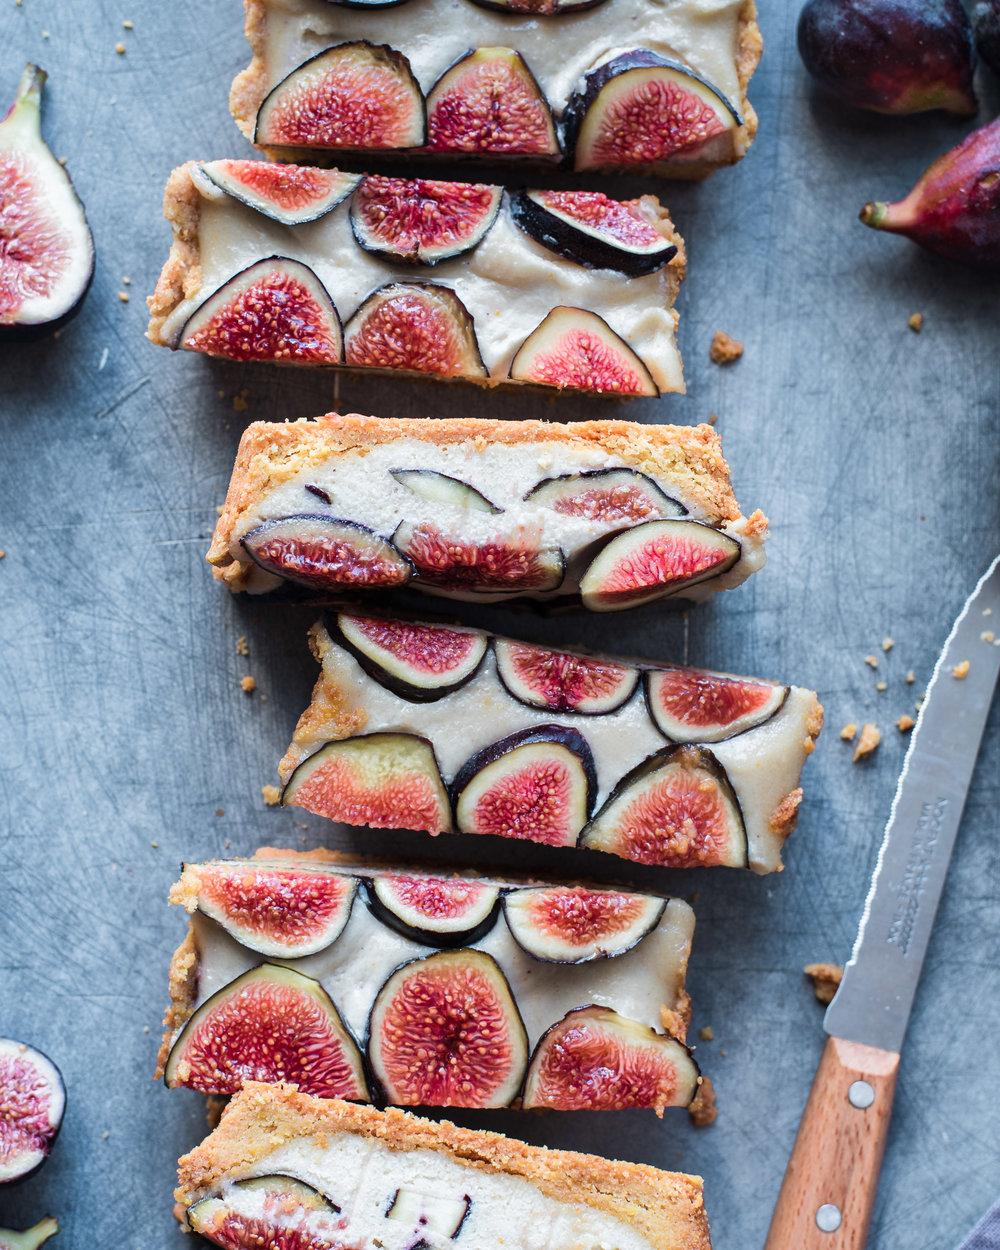 Fig Tart with Coconut-Cashew Cream - V, GF